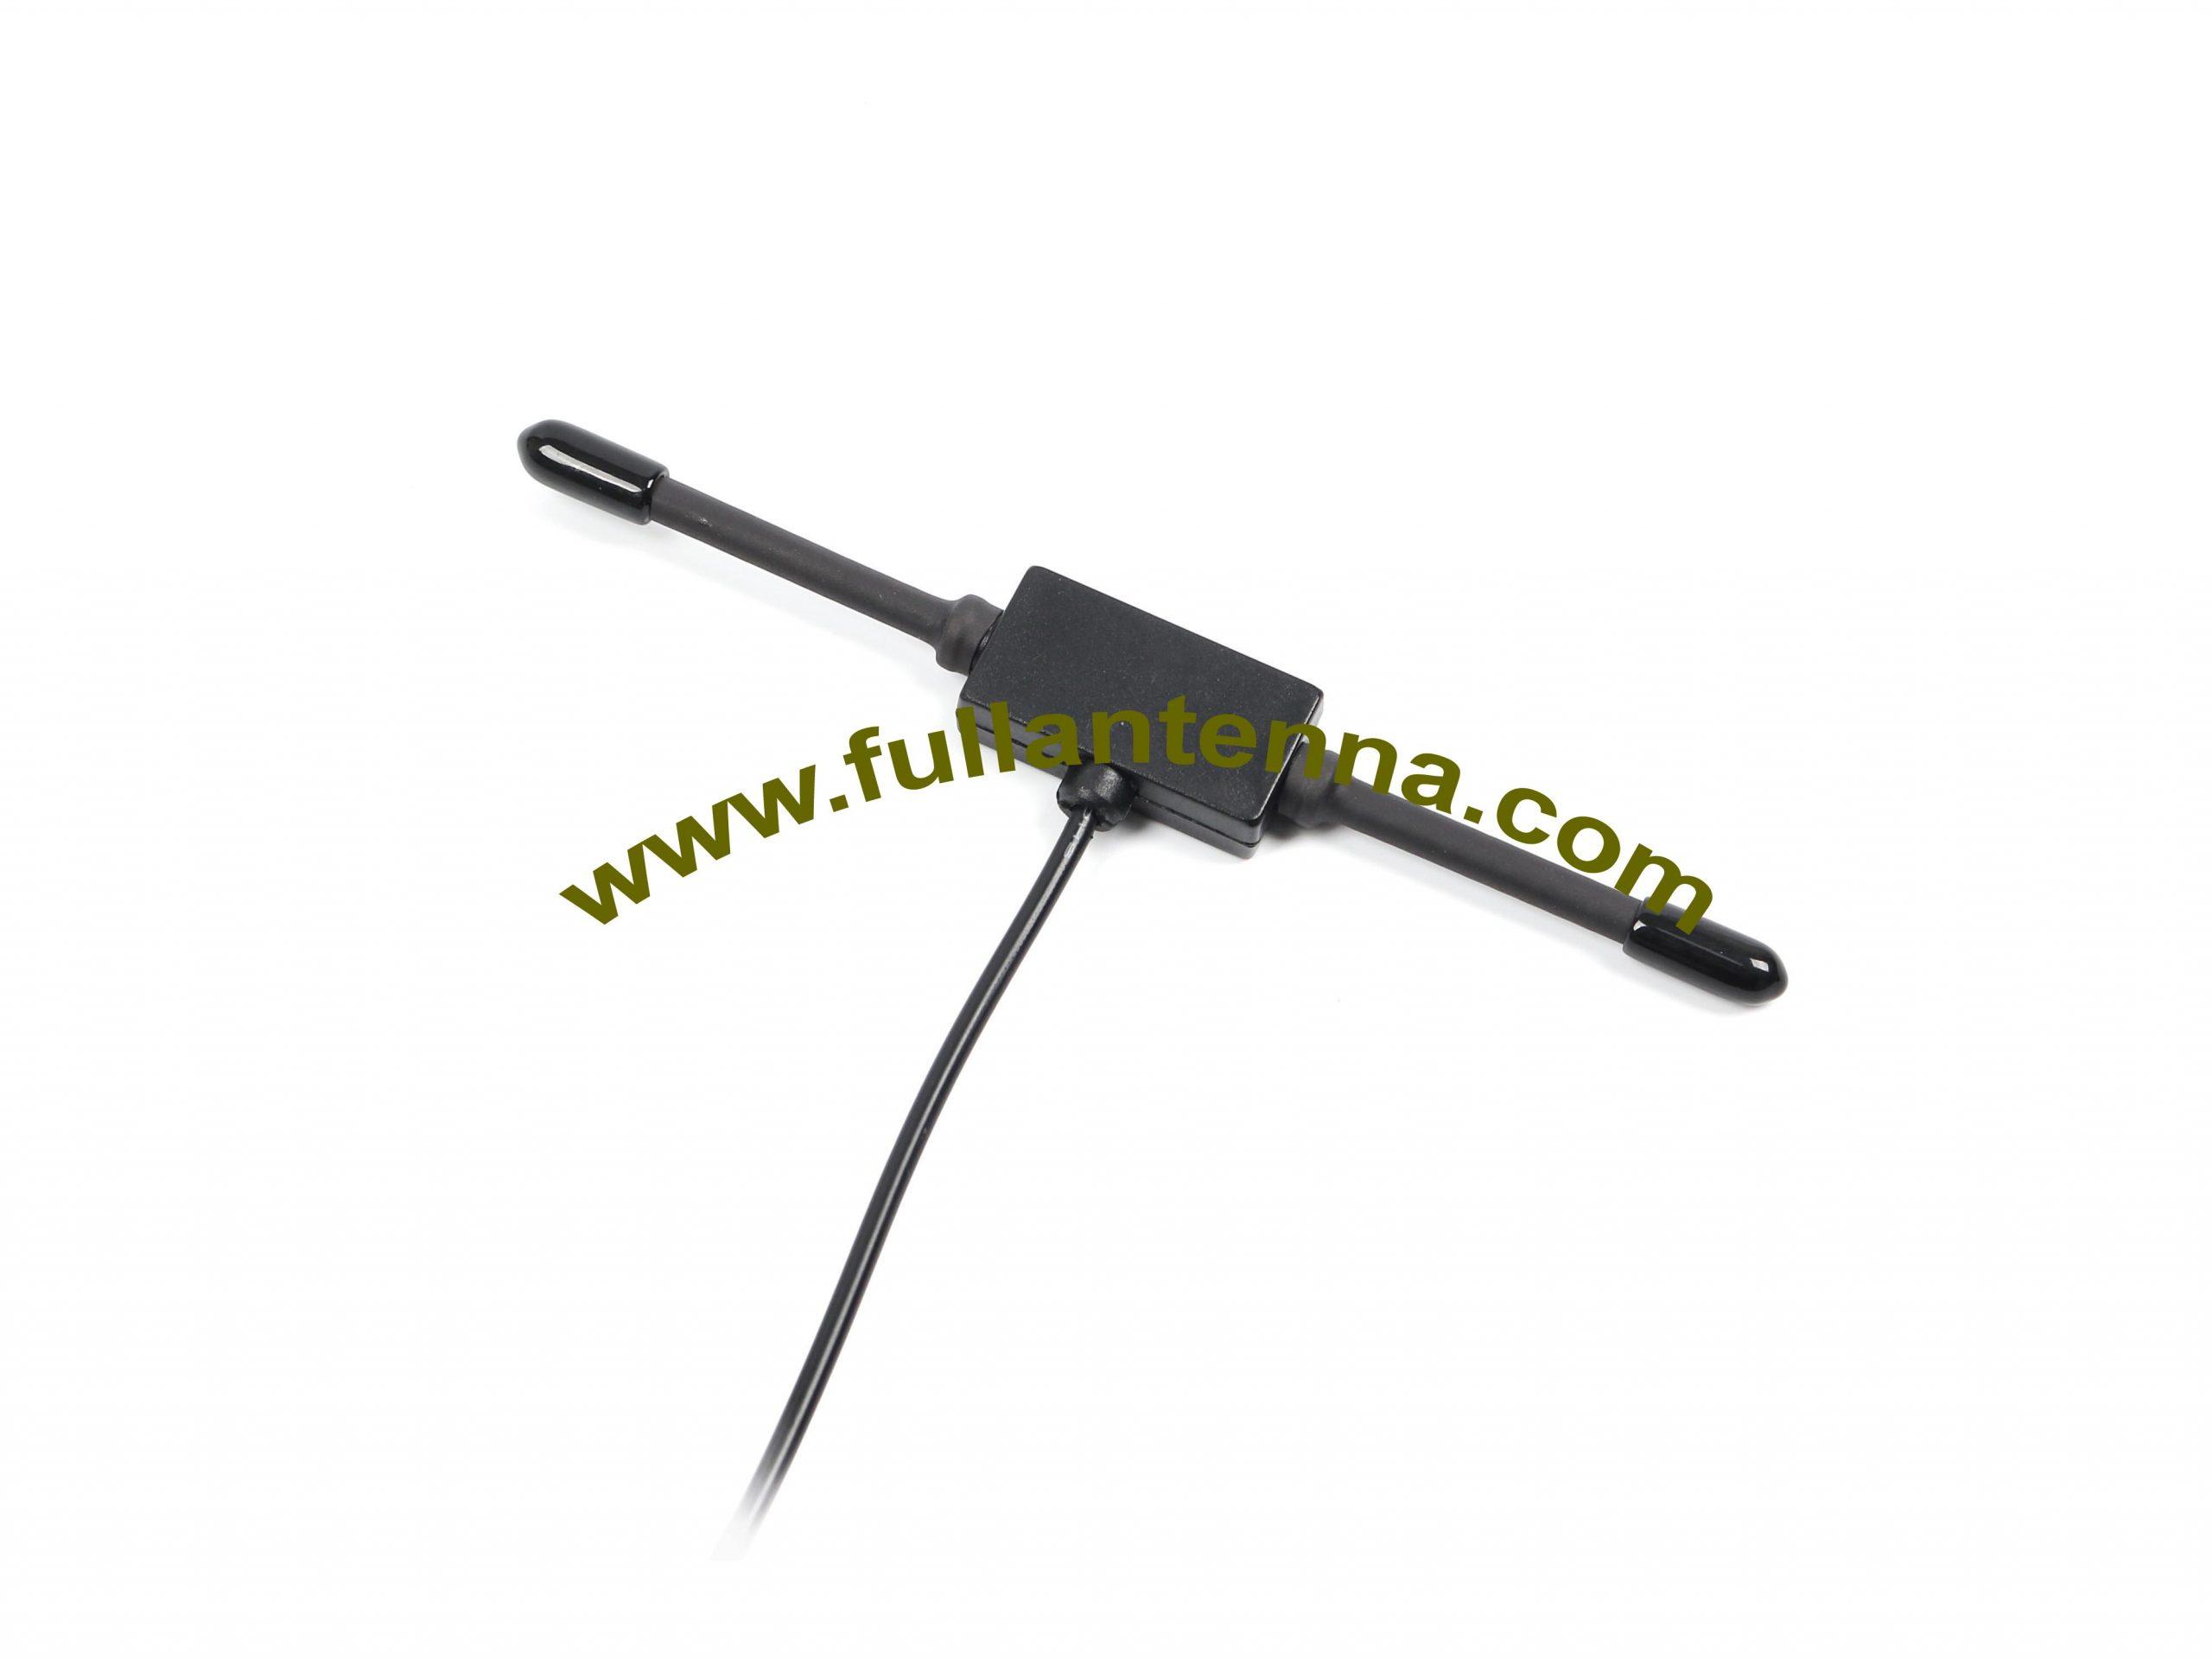 P/N:FAGSM.07,GSM External Antenna,adhesive glass mount 3dbi gain SMA male